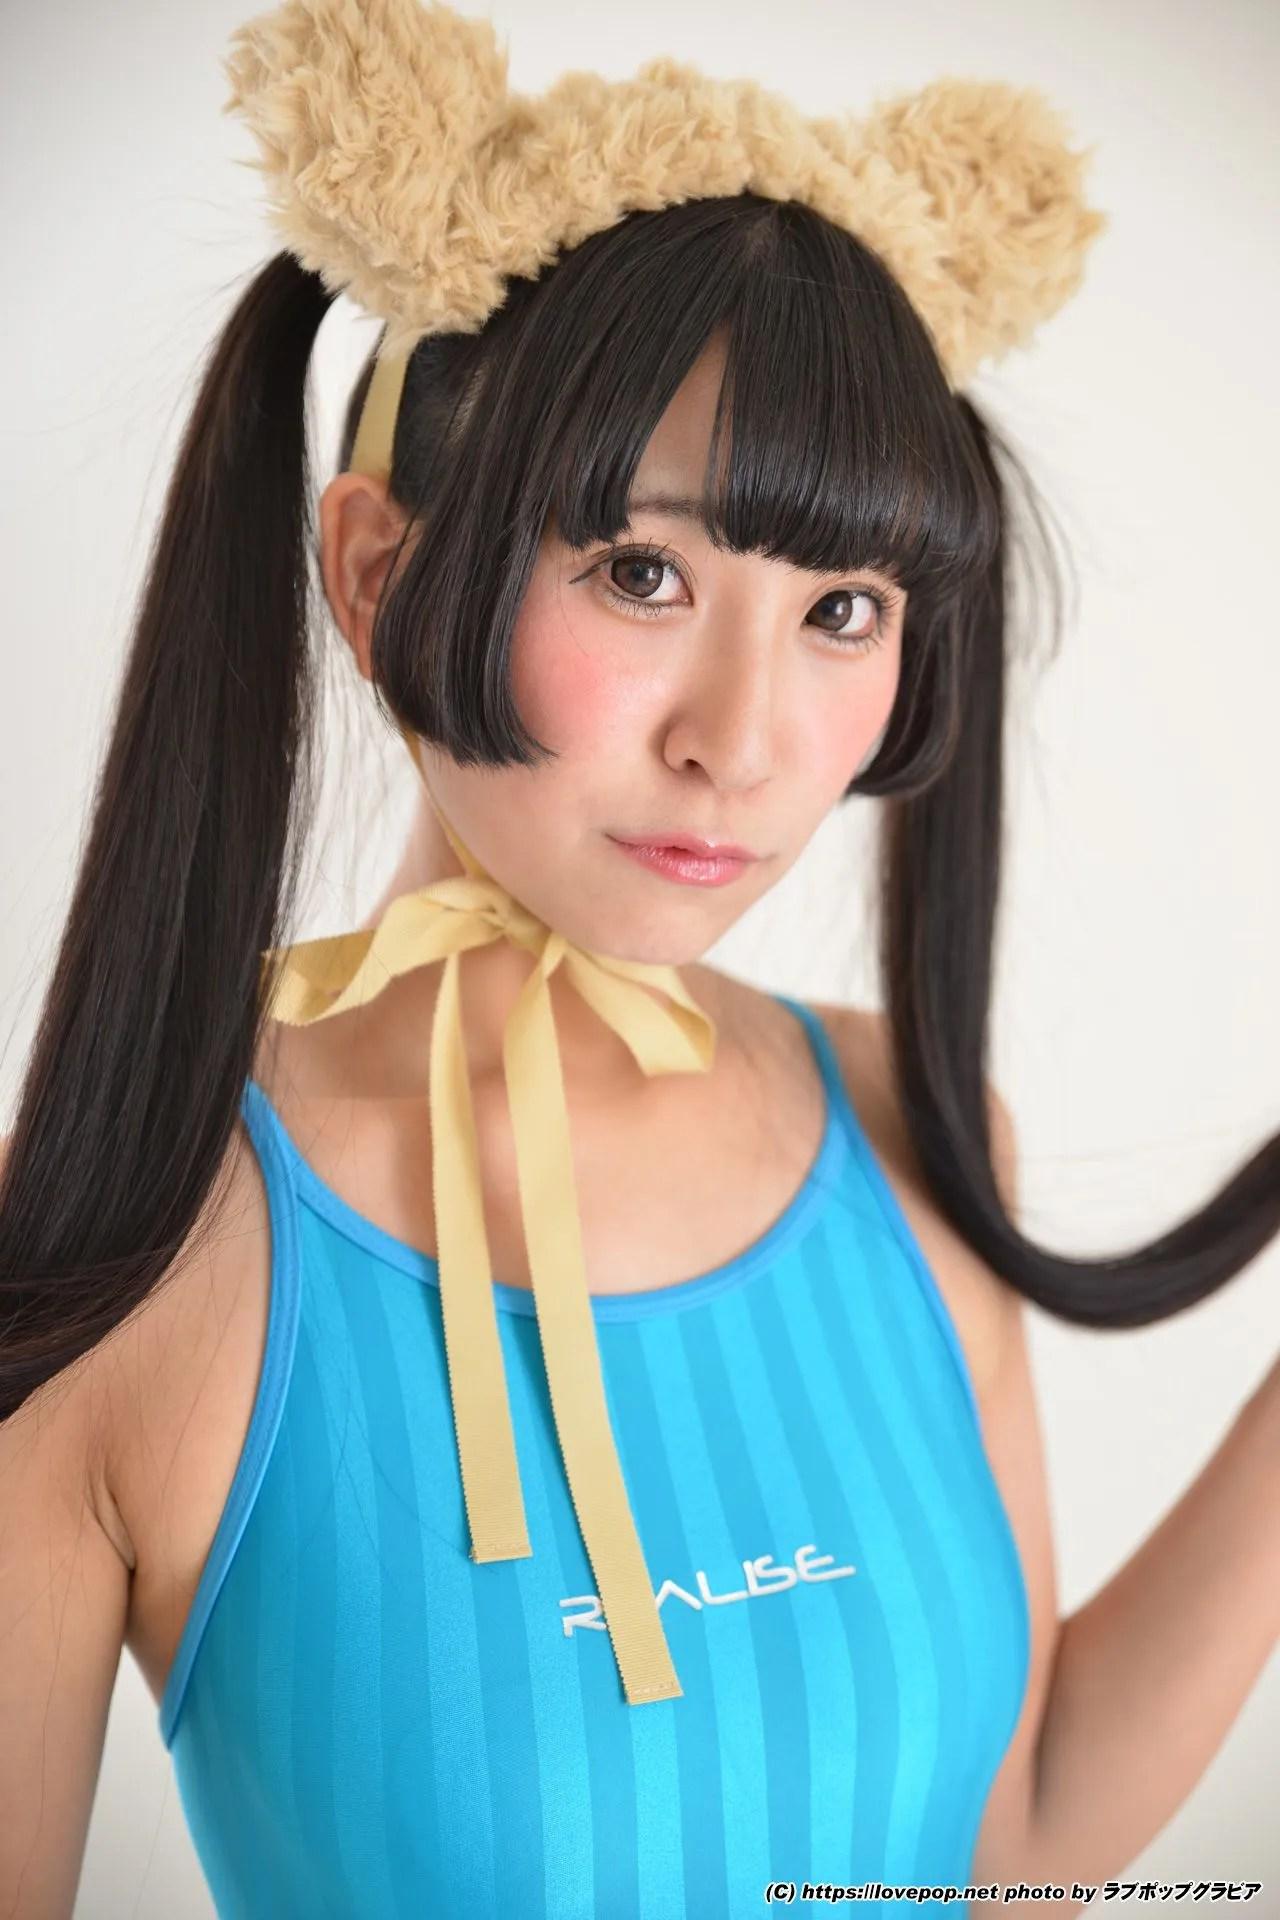 [LOVEPOP] 五十岚もか Moka Igarashi Photoset 11 写真集[50P]插图(4)